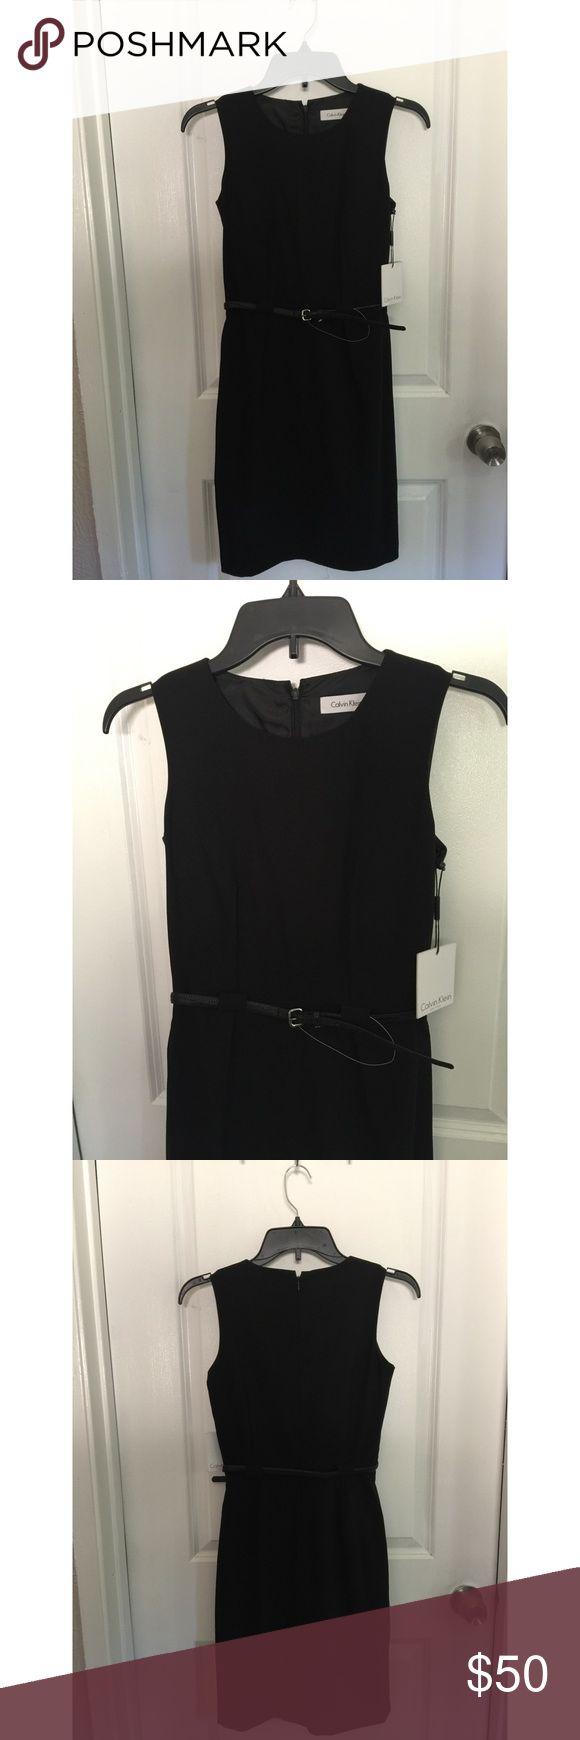 NWT Calvin Klein black dress with belt size 2P New with tags! Calvin Klein black dress with belt in a size 2 P. Calvin Klein Dresses Midi